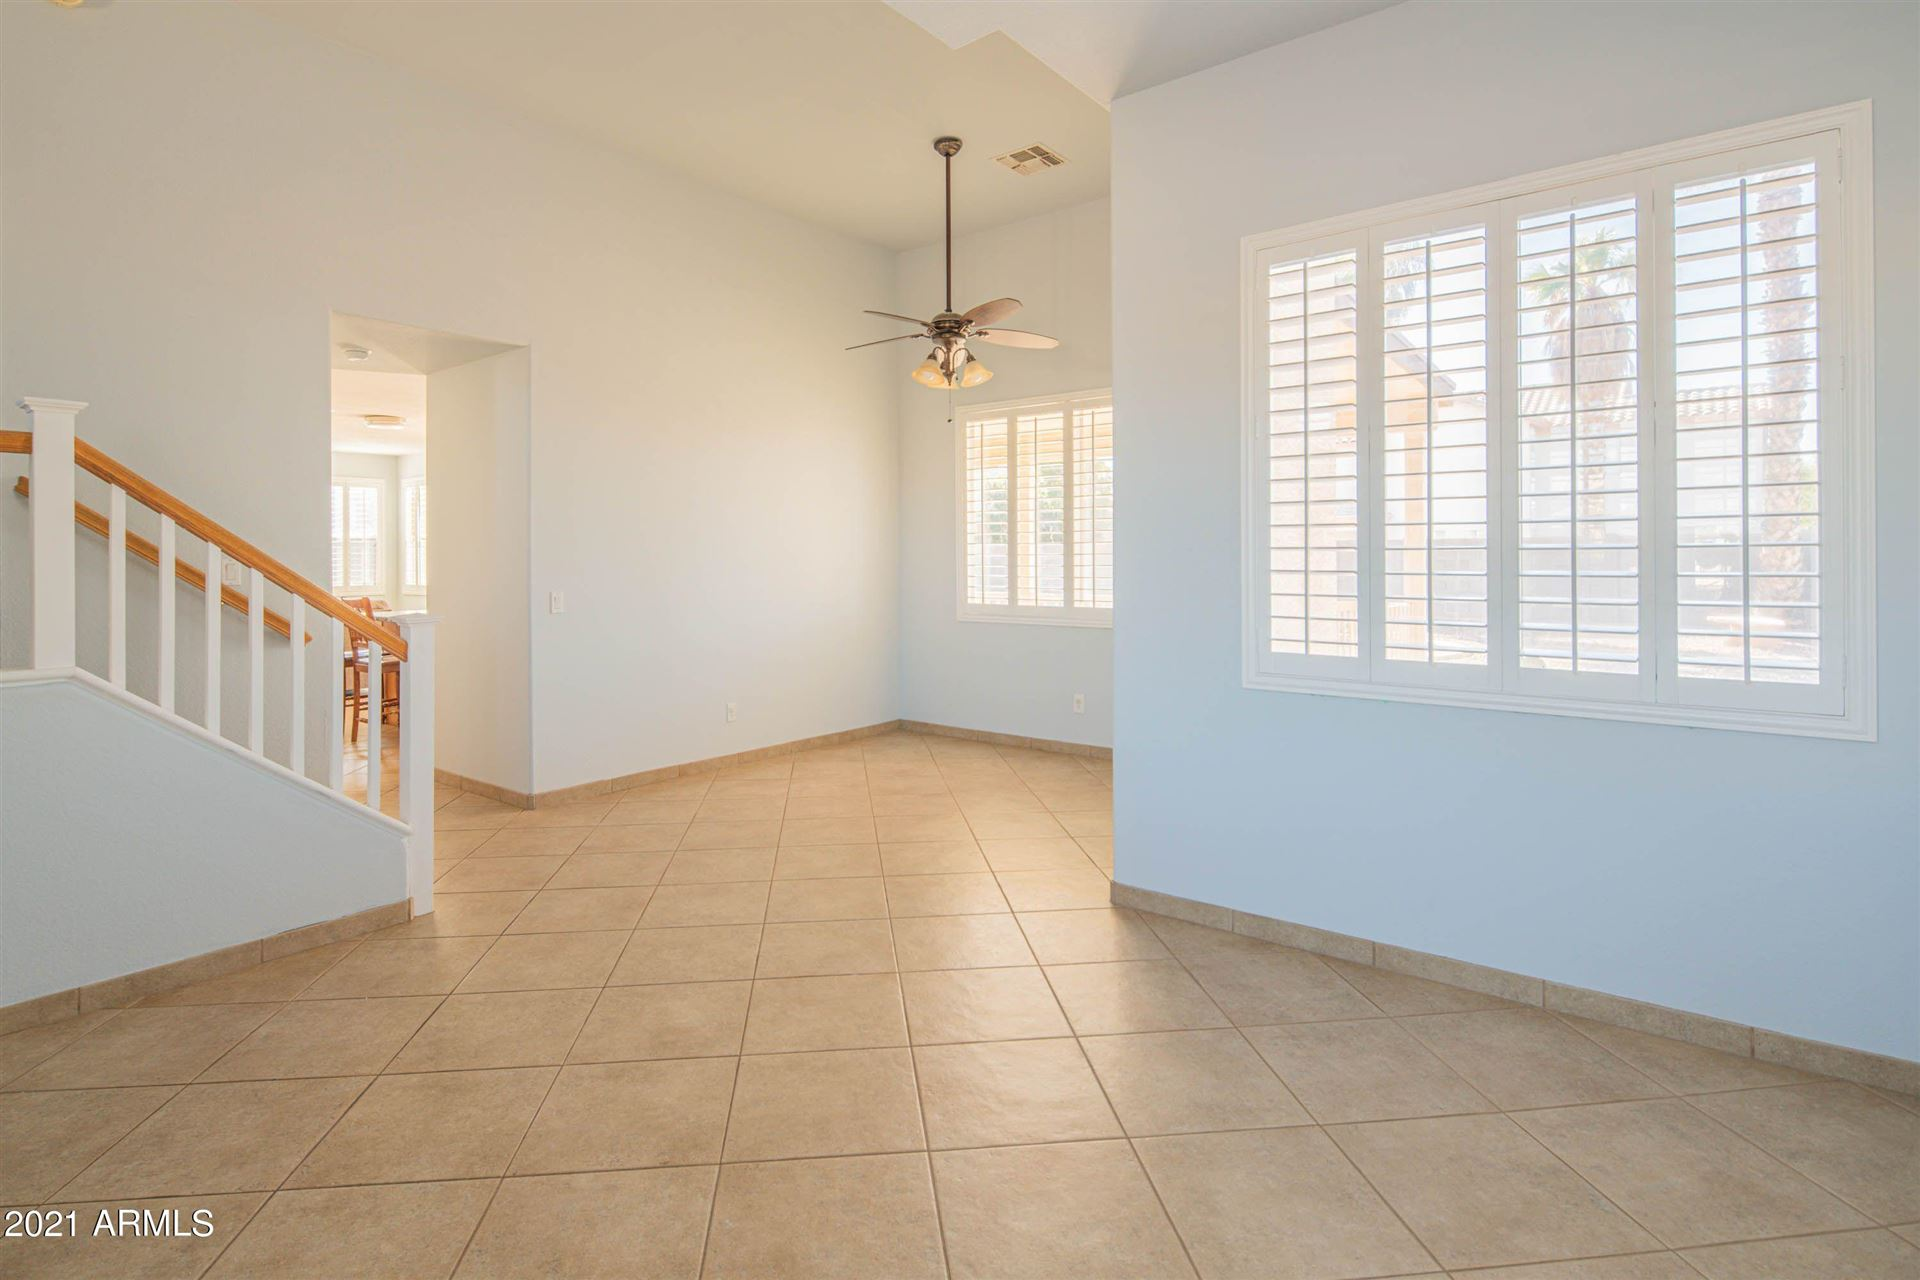 Photo of 16091 W GRANT Street, Goodyear, AZ 85338 (MLS # 6197864)